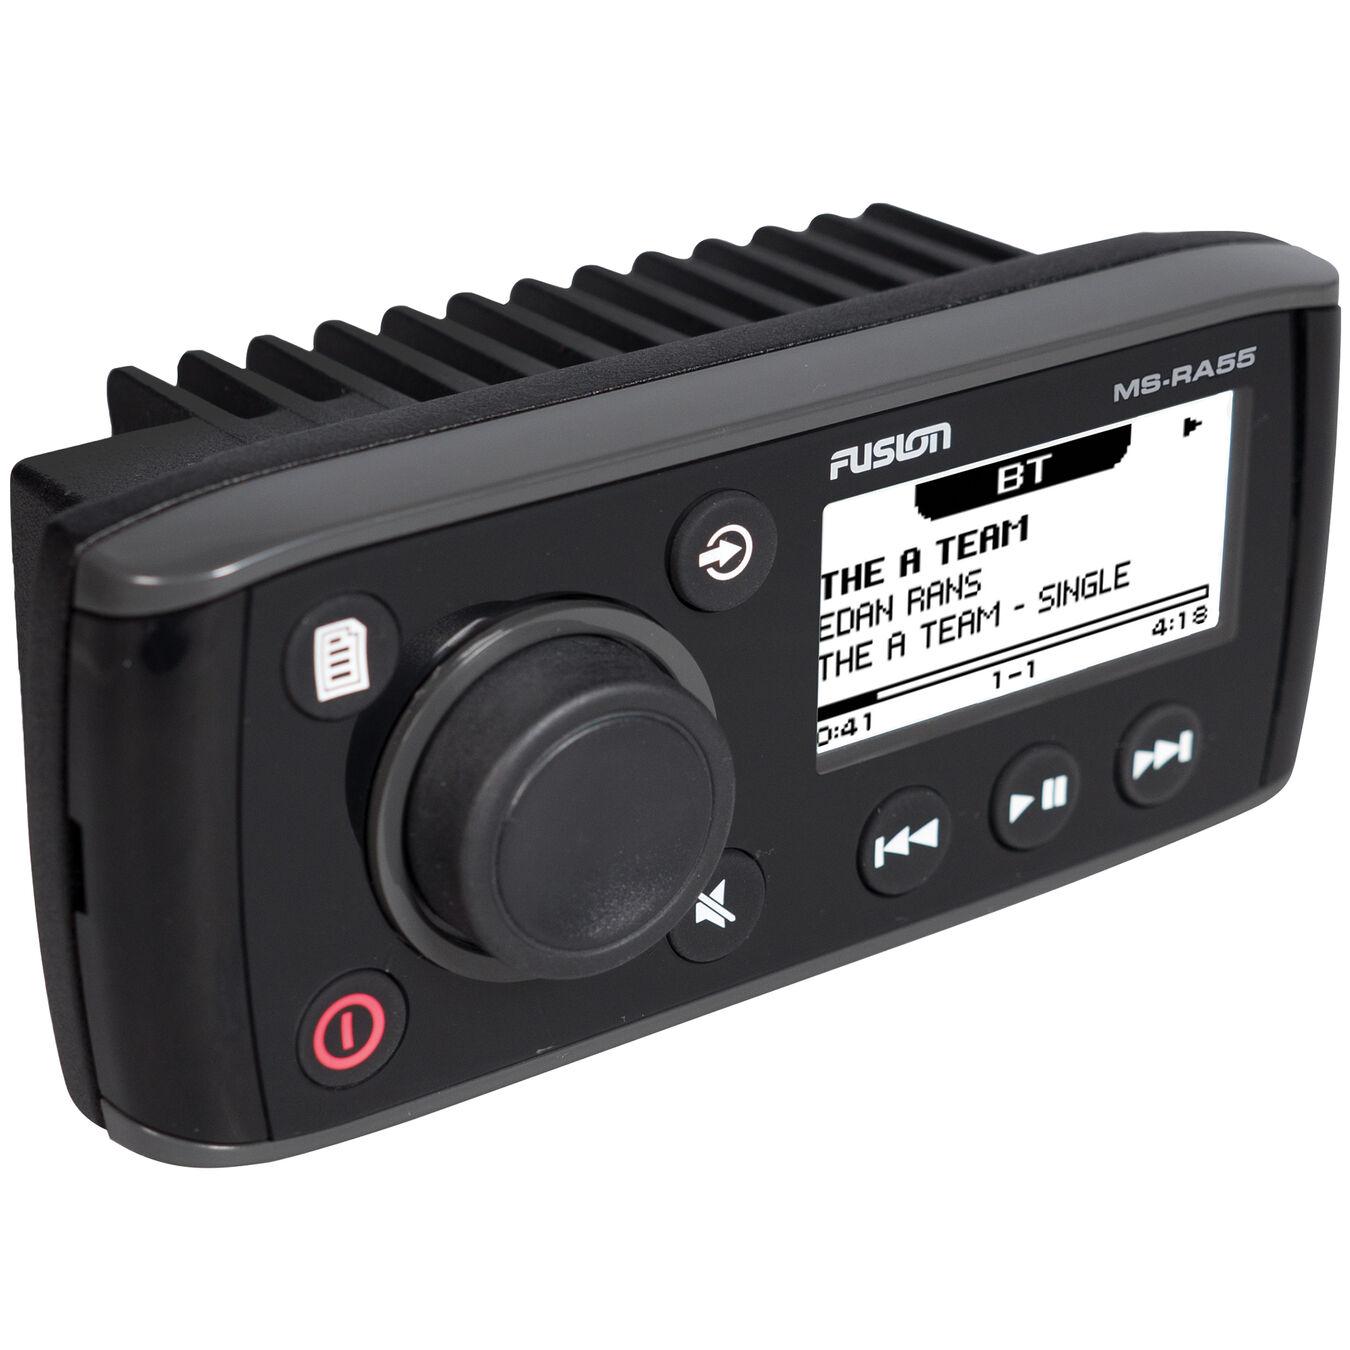 Fusion Electronics 0100171600 Ms-ra55 Compact Bluetooth Marine Stereo